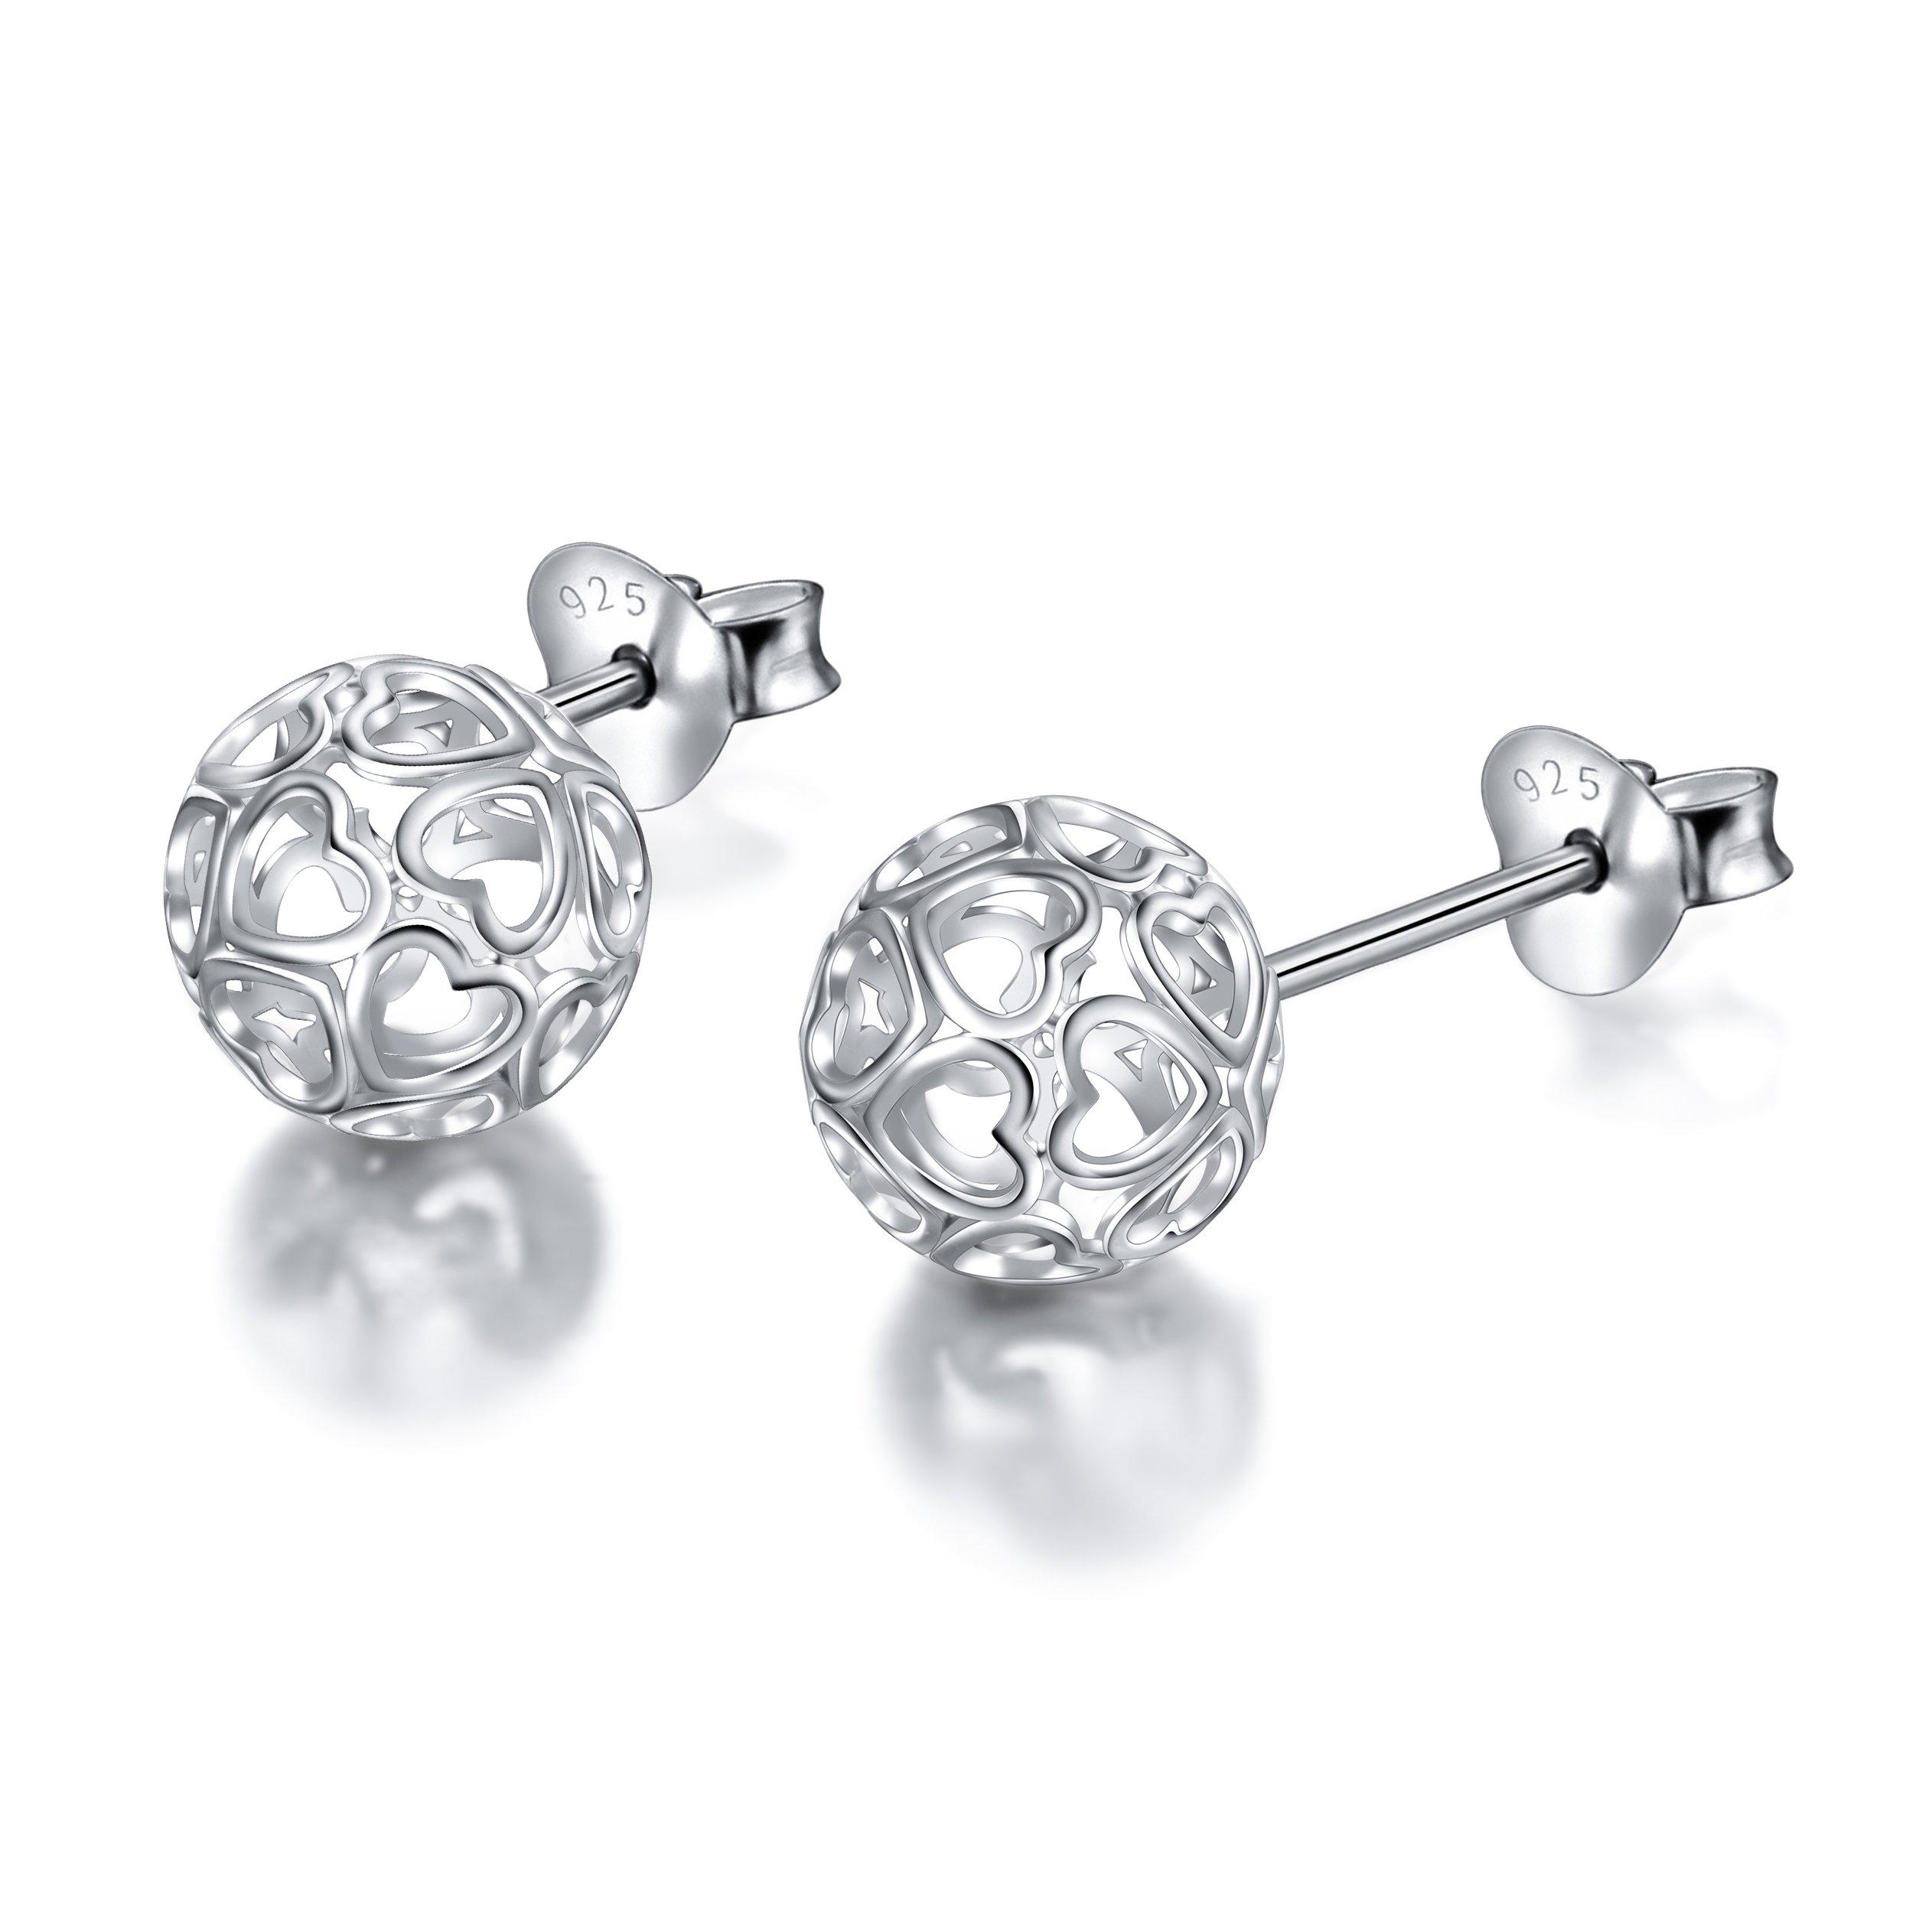 S9S925 Sterling Silver Heart Round Ball Stud Heart Earrings for Women Girl Mother